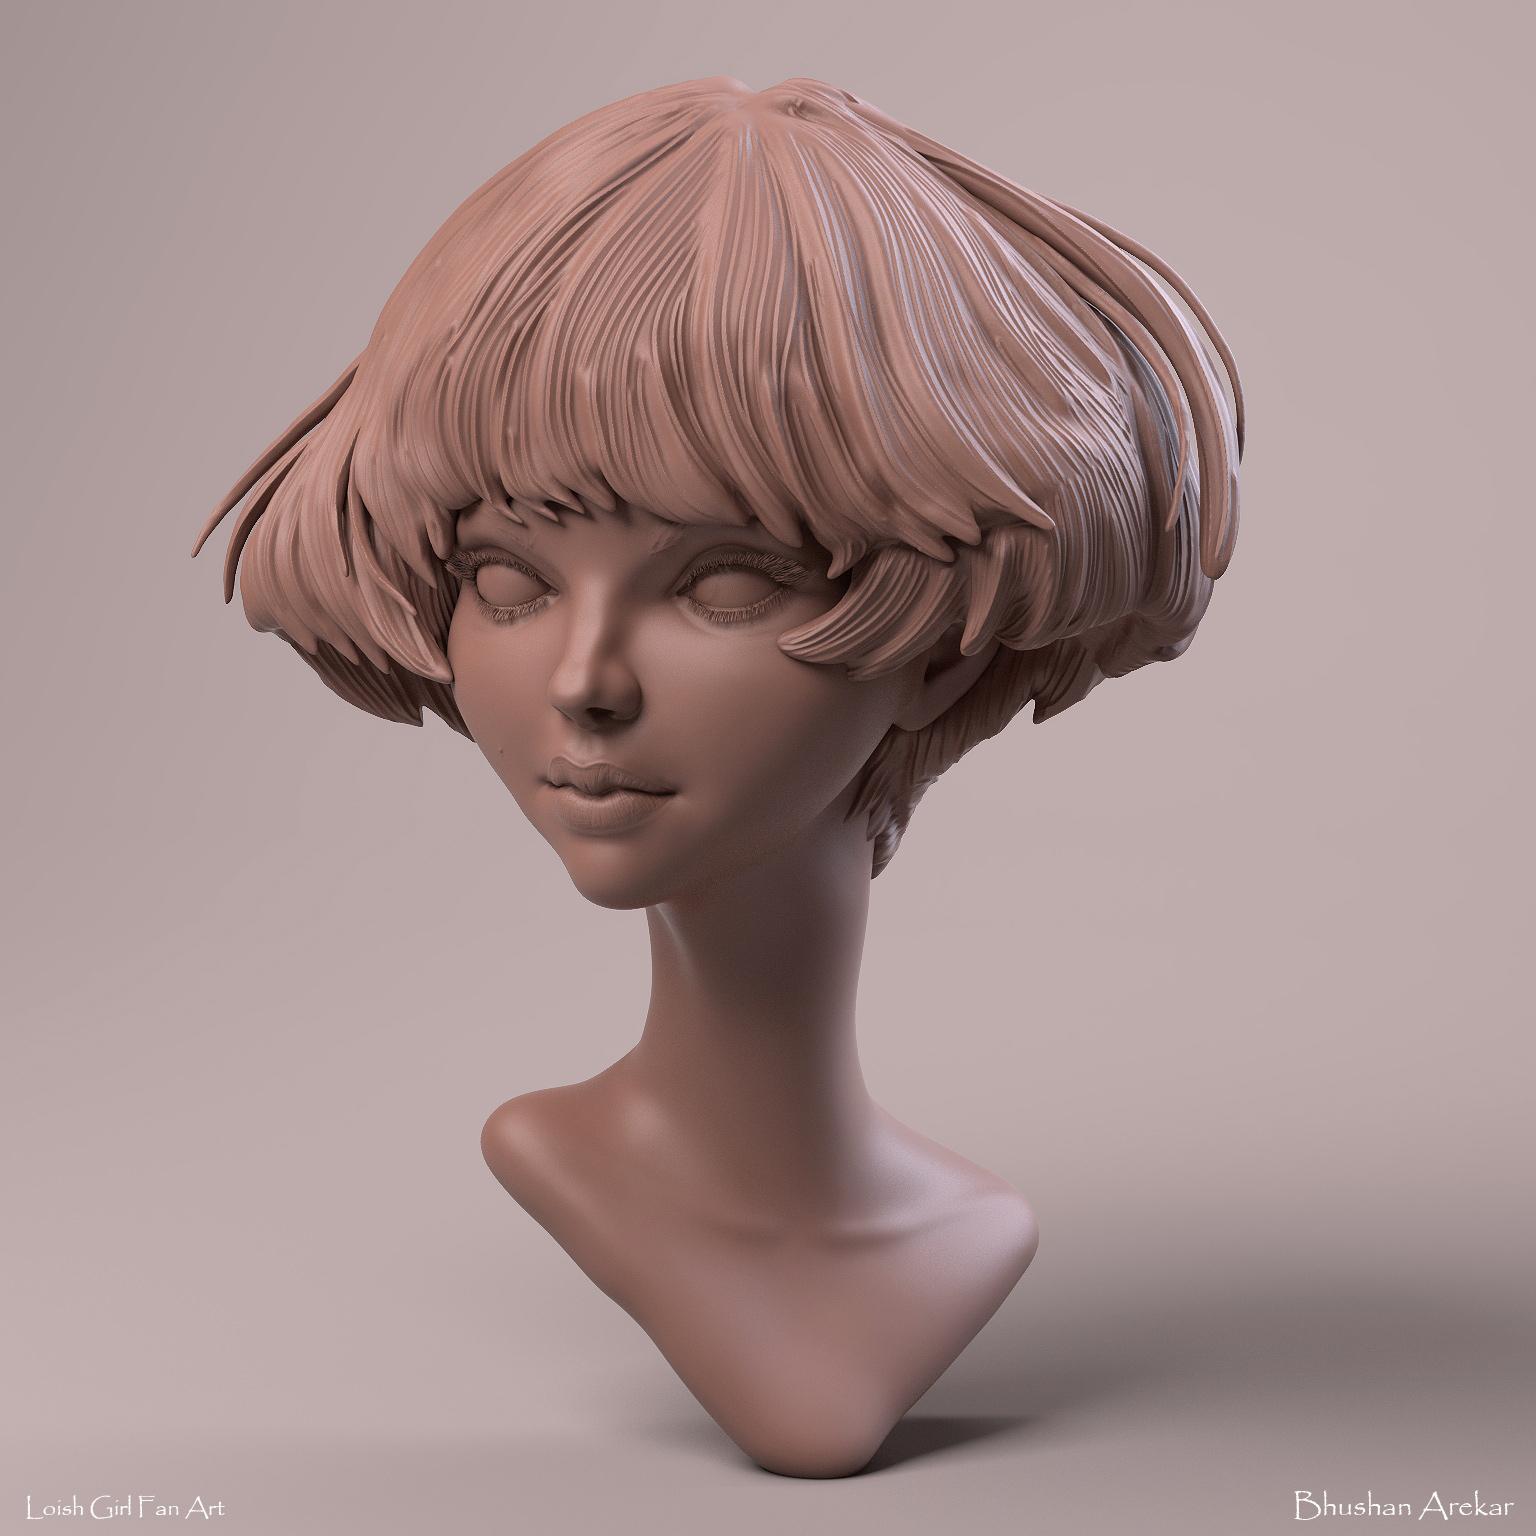 Loish-Girl_Clay-Render.jpg